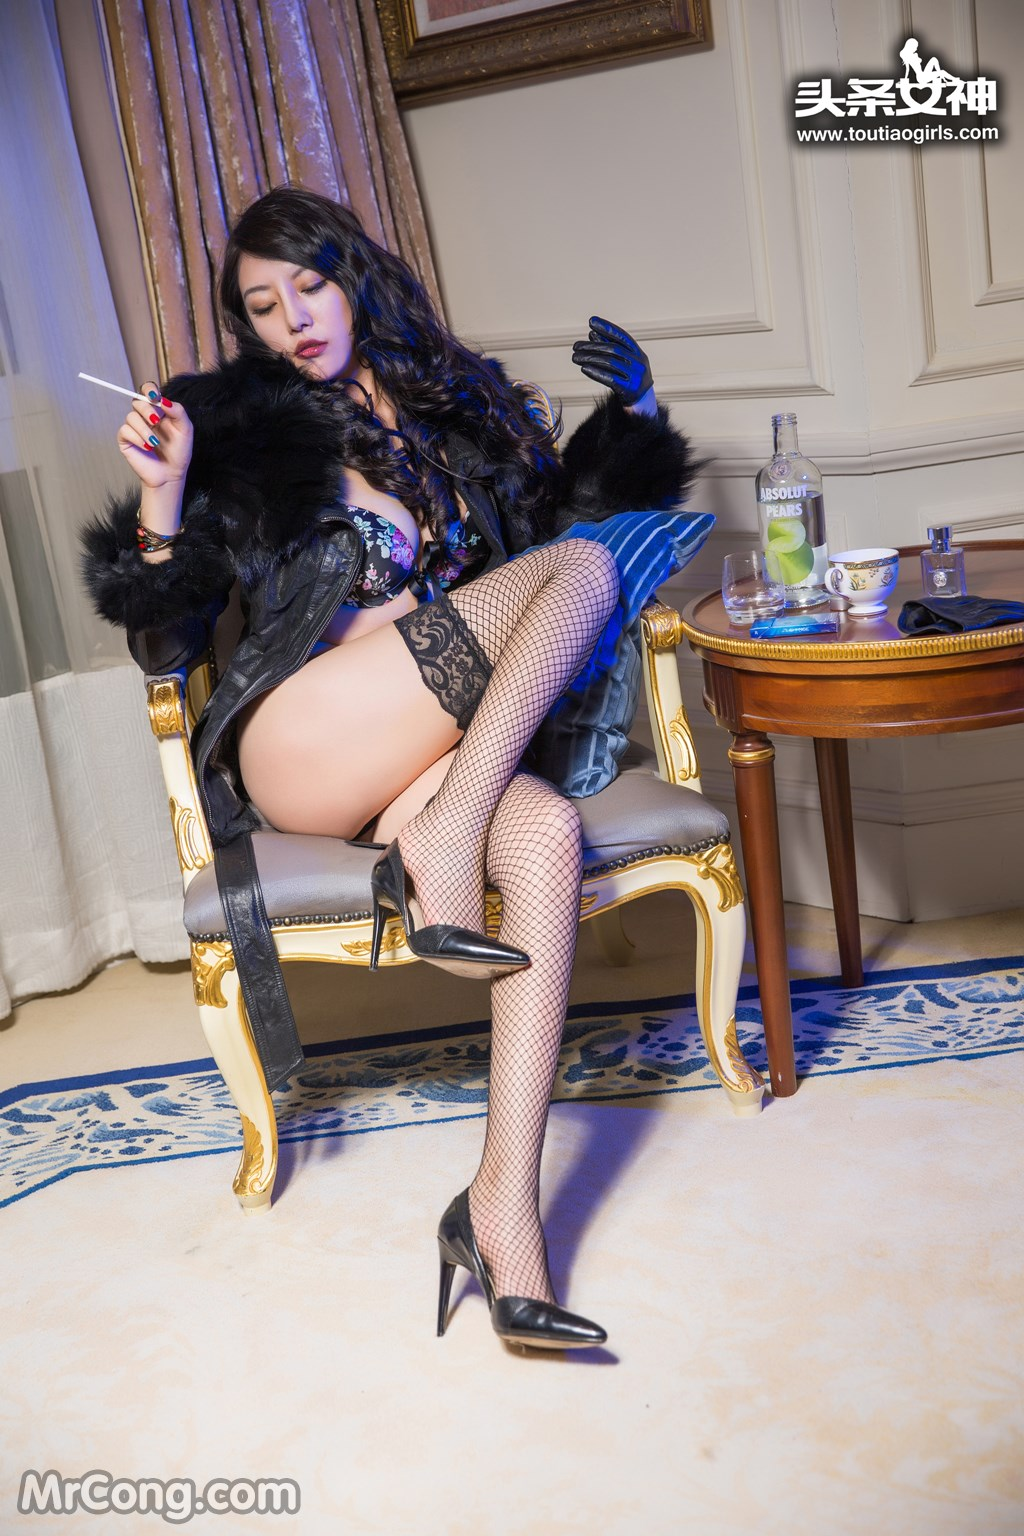 Image MrCong.com-TouTiao-2016-12-26-Dan-Dan-005 in post TouTiao 2016-12-26: Người mẫu Dan Dan (丹丹) (33 ảnh)